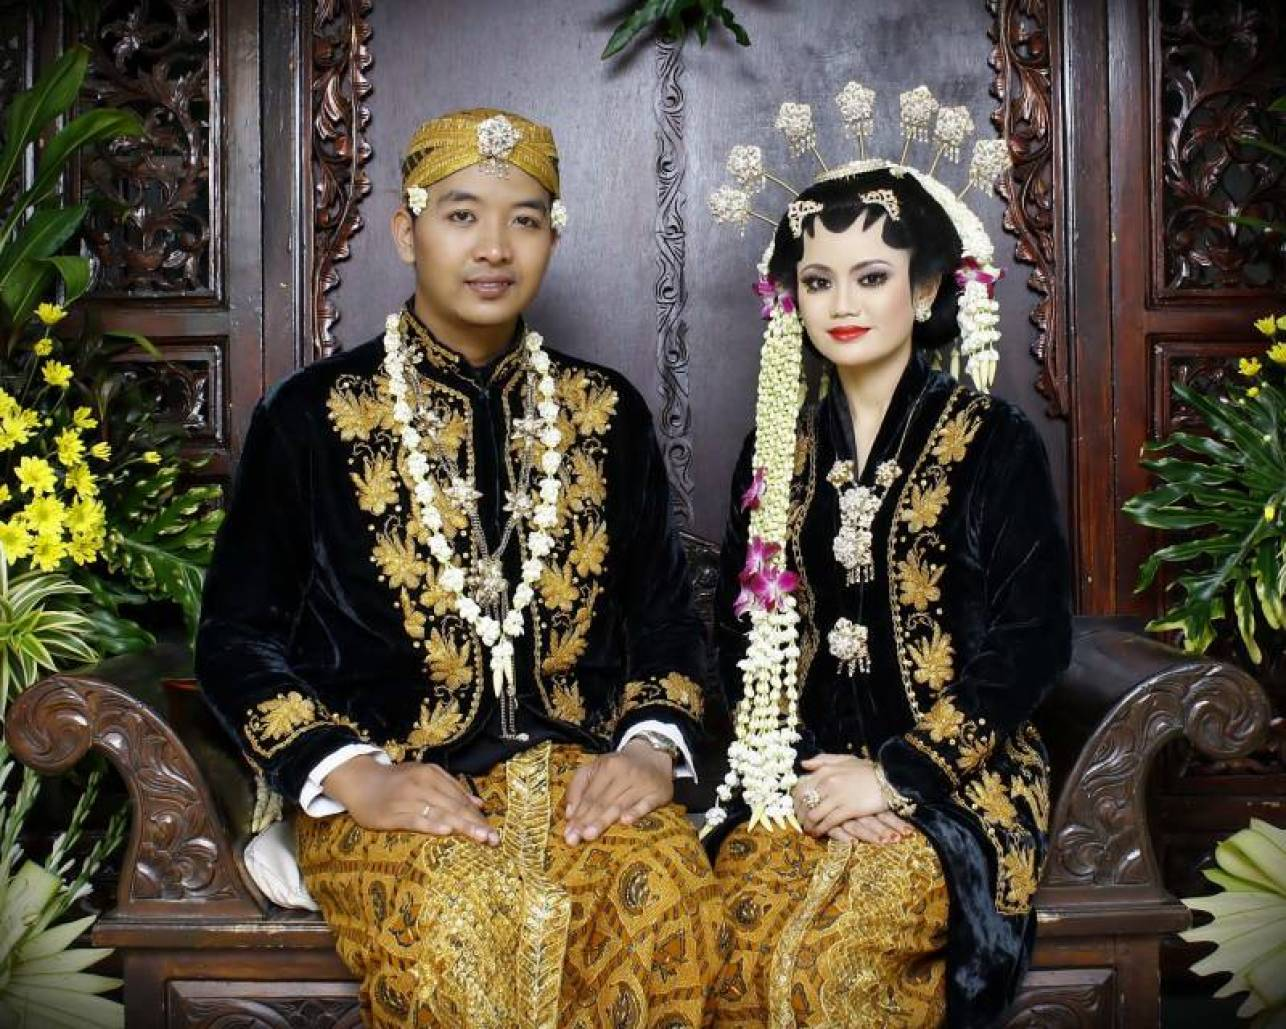 LENGKAP] Daftar 11 Pakaian Adat Jawa Timur Beserta Aksesorisnya